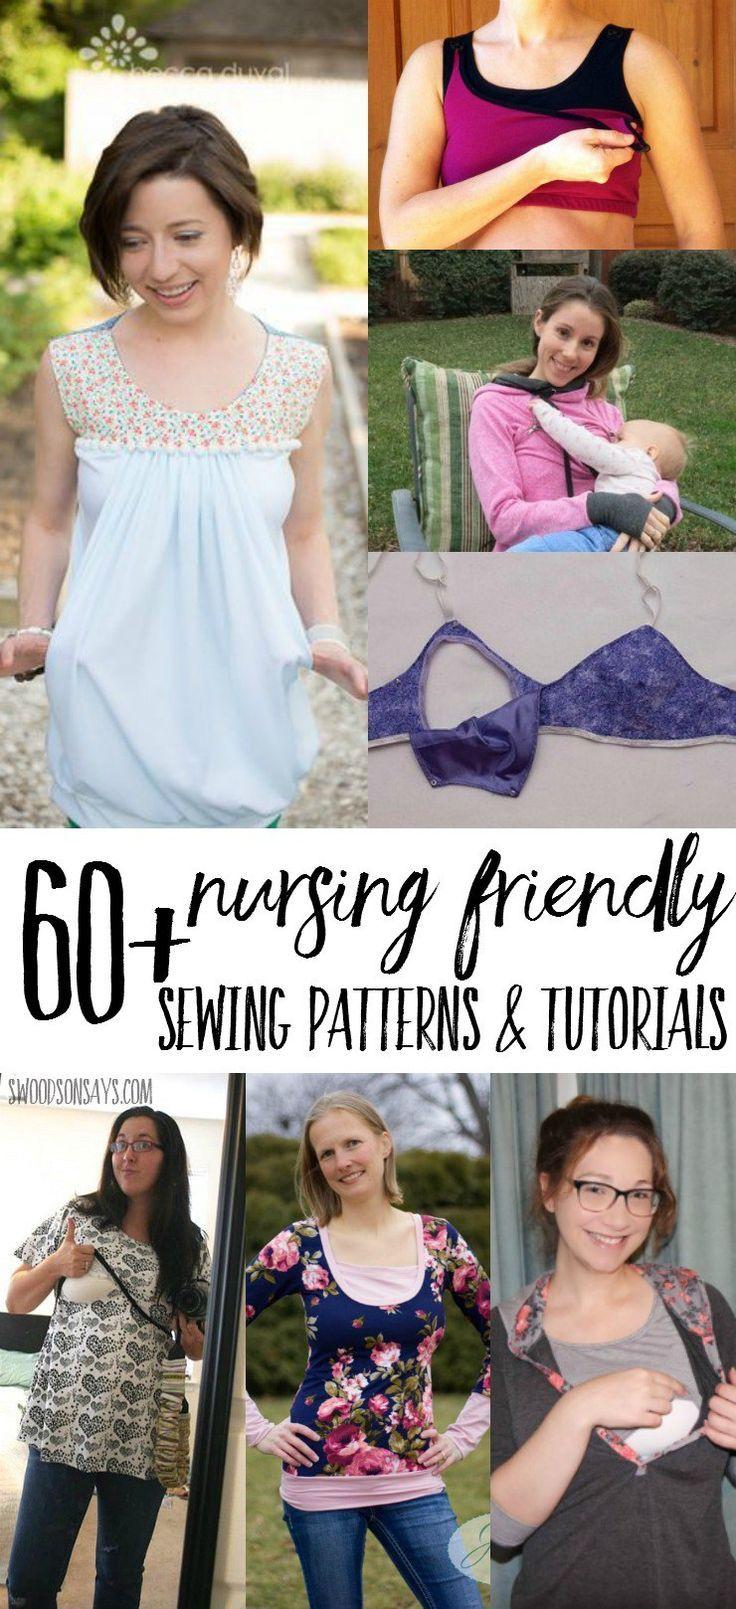 Nursing friendly pdf sewing patterns alteration tutorials pdf looking for nursing sewing patterns heres a list of over 60 pdf sewing patterns that ombrellifo Choice Image